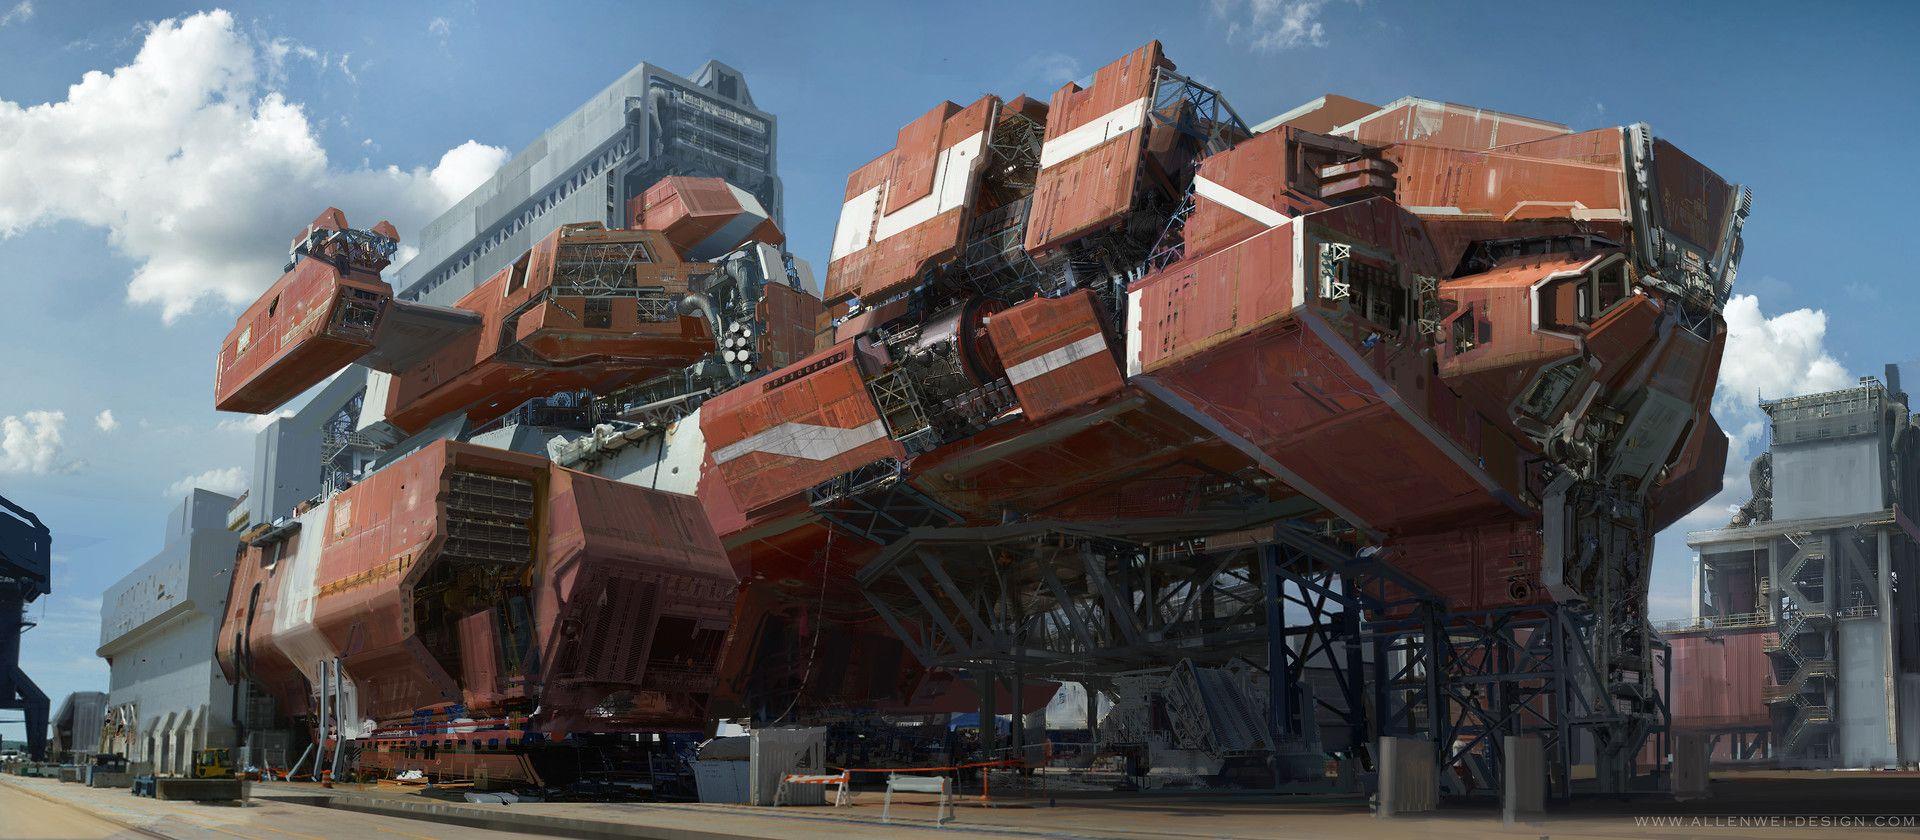 ArtStation - Red-Flame-ship, Allen wei